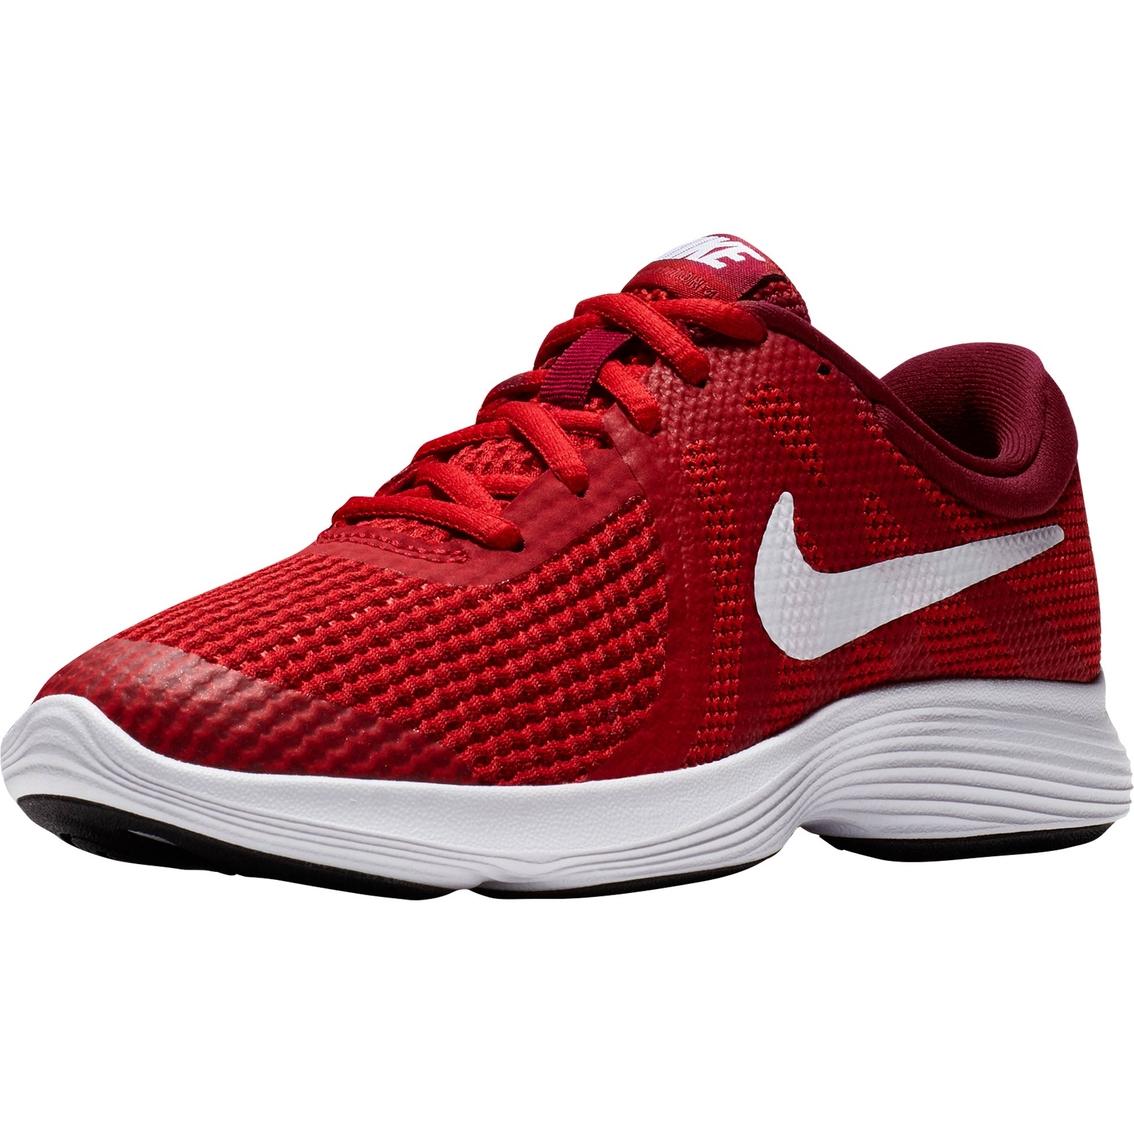 01f536f92eb6 Nike Grade School Boys Revolution 4 Running Shoes